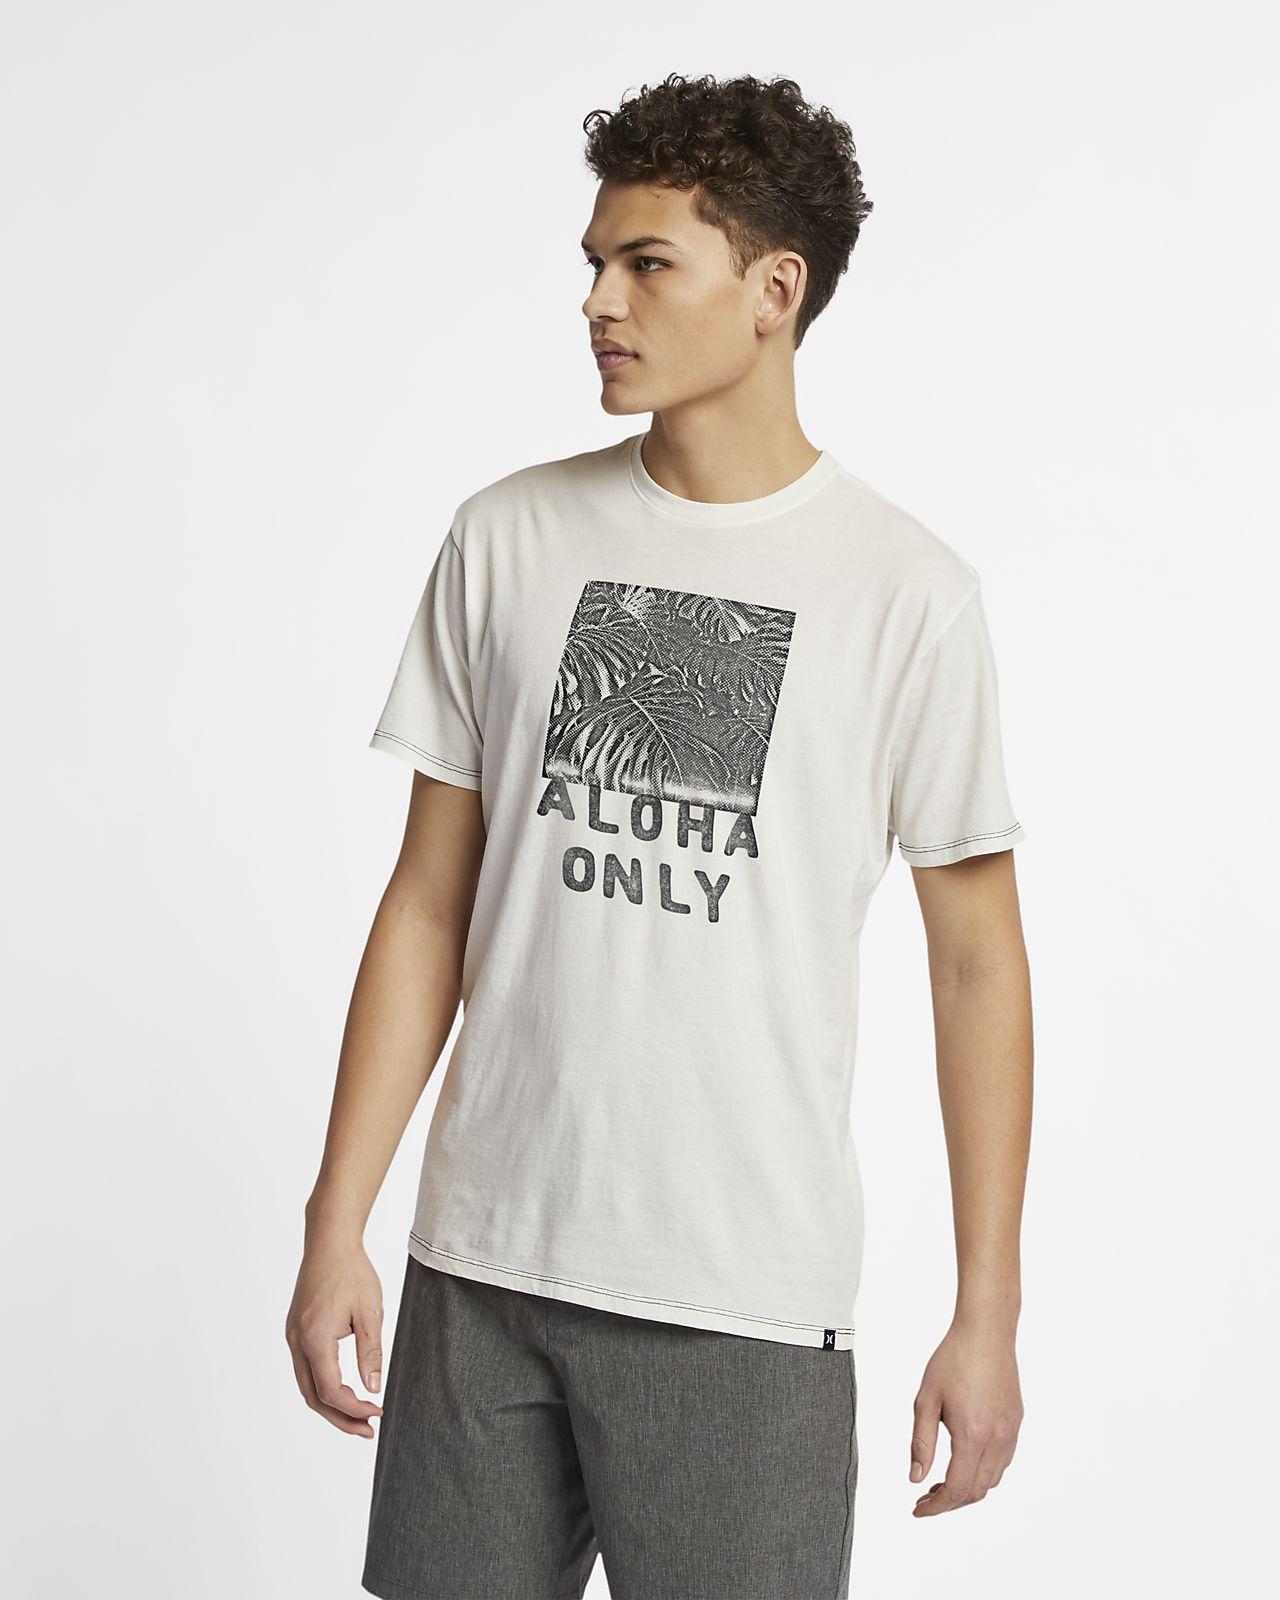 T-shirt Hurley Aloha Only para homem